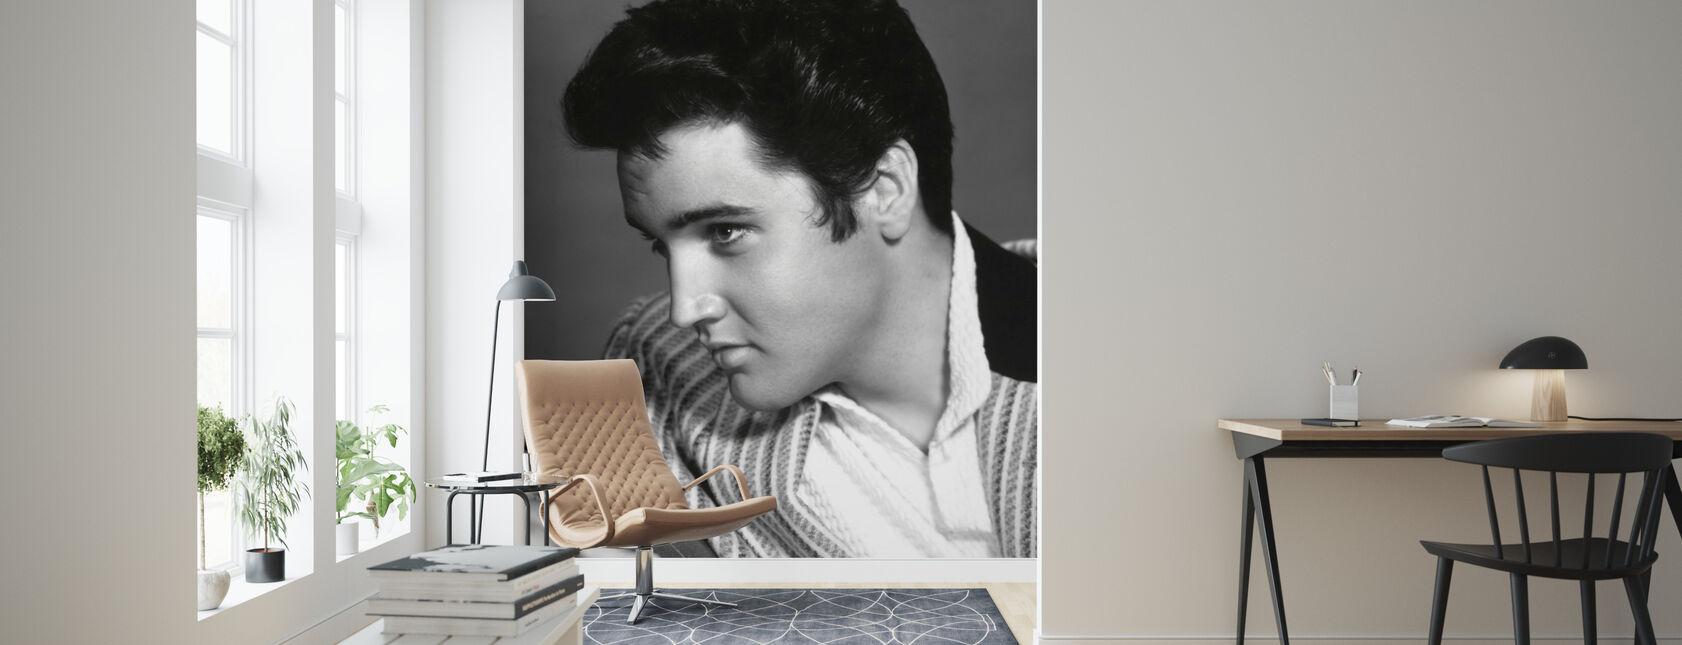 Elvis Presley - Wallpaper - Living Room